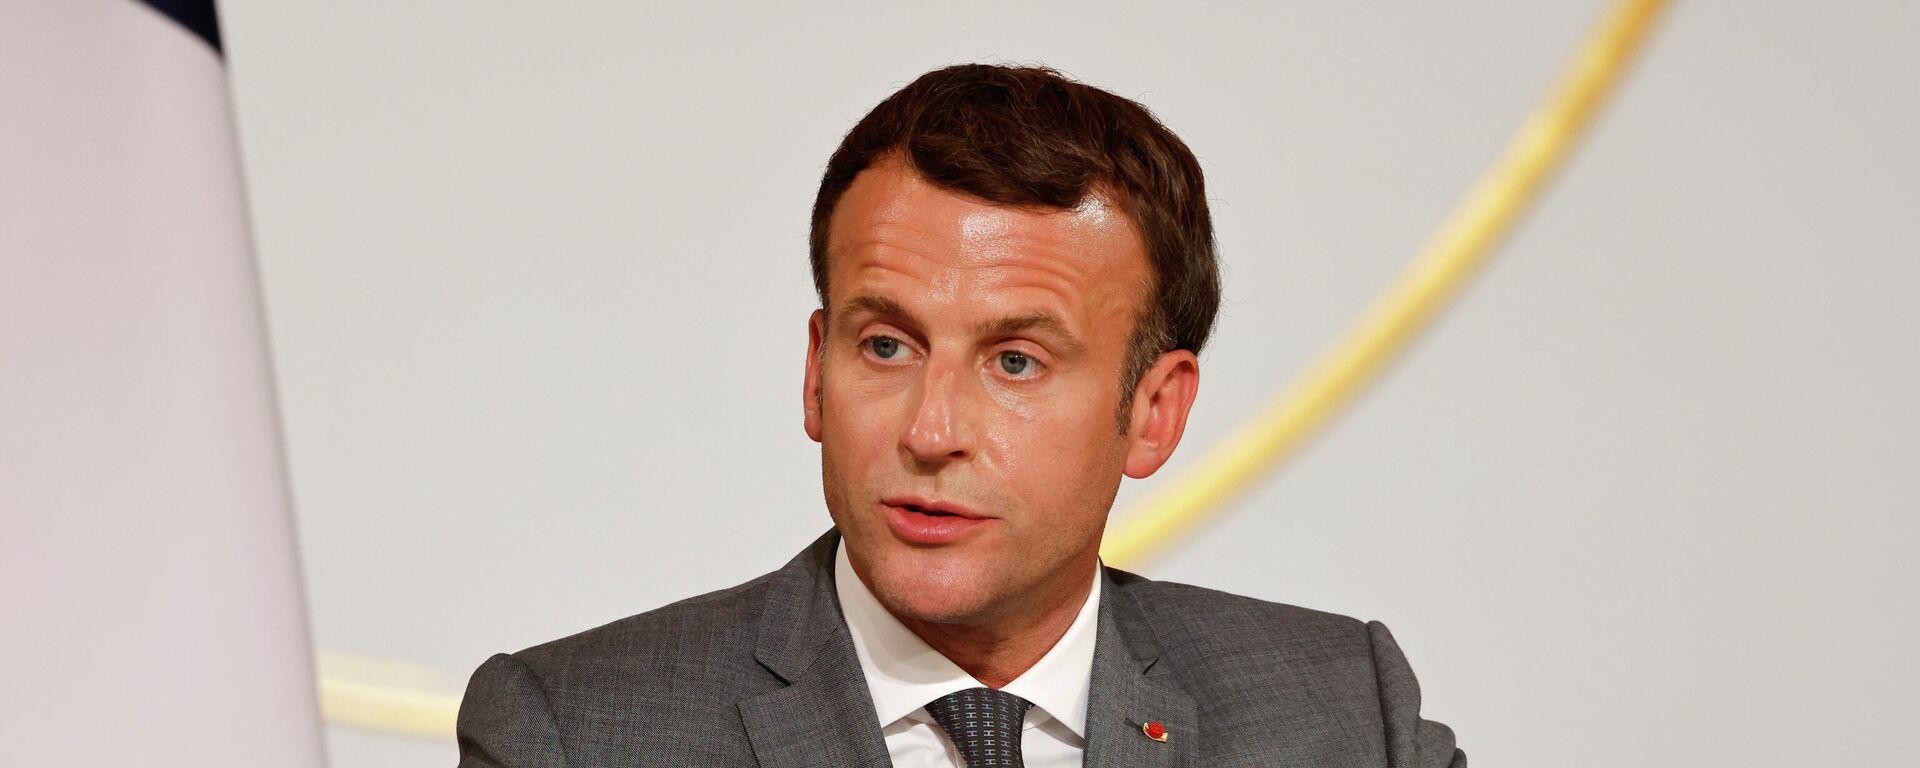 Emmanuel Macron, presidente de Francia - Sputnik Mundo, 1920, 21.07.2021